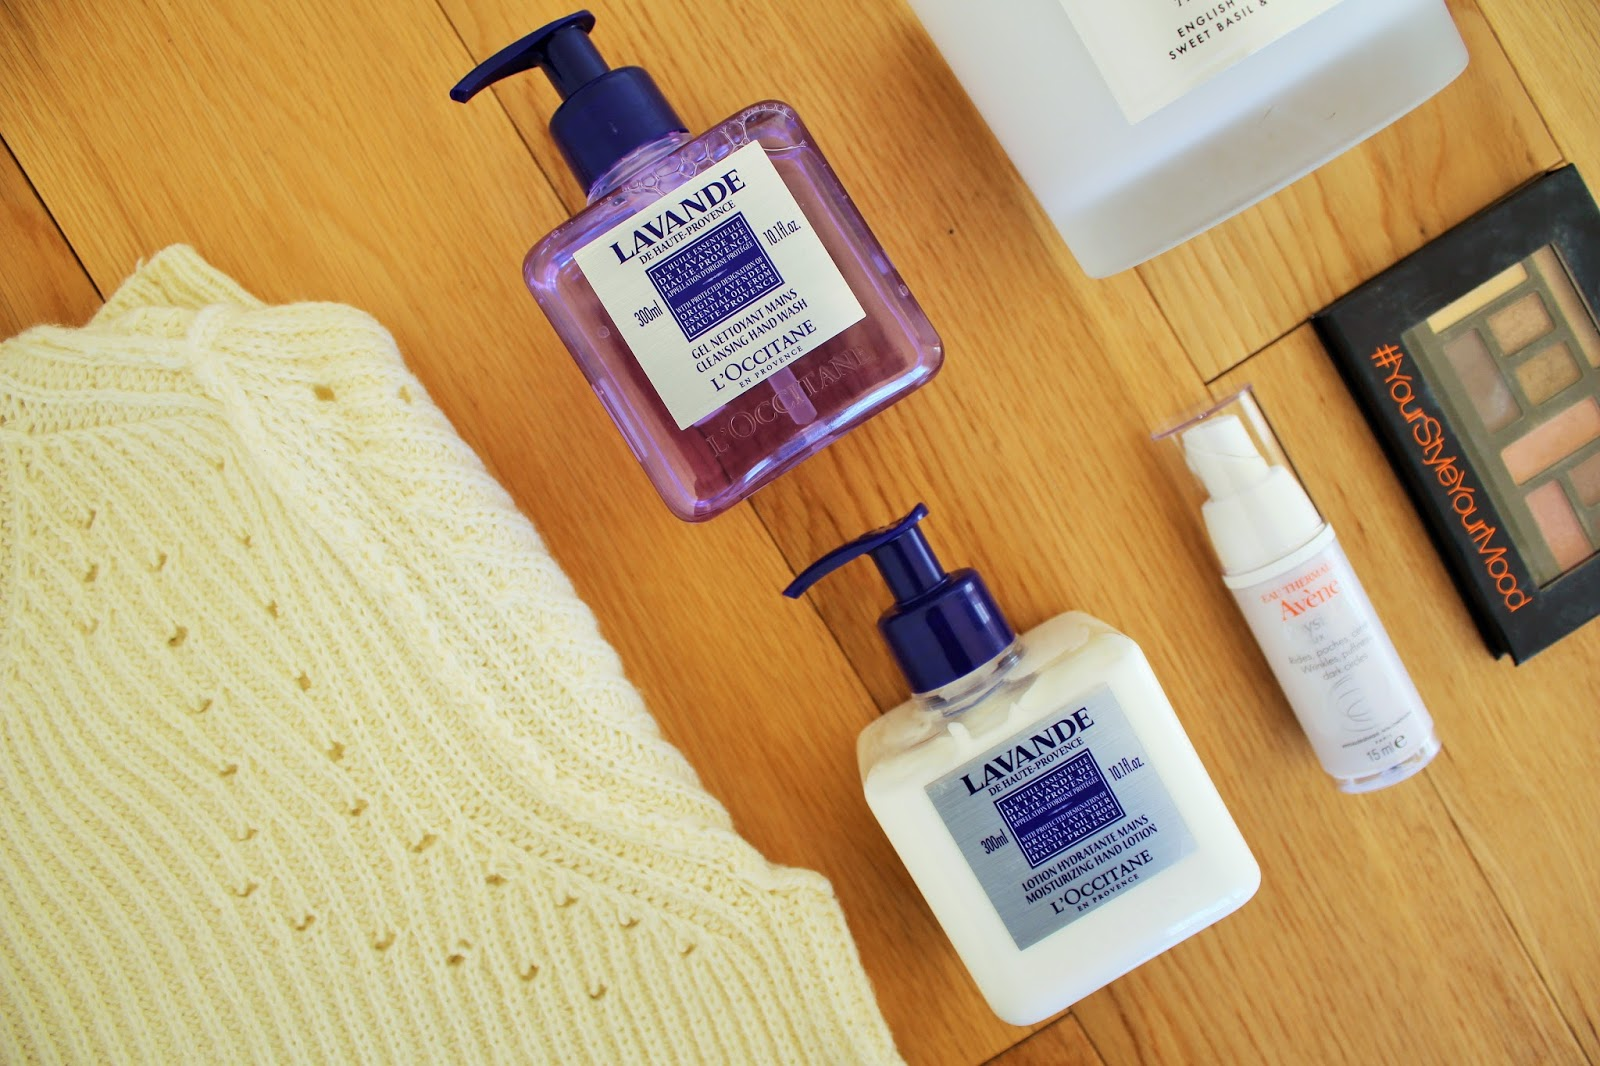 February Favourites - L'Occitane Hand Wash and Hand Cream in Lavender